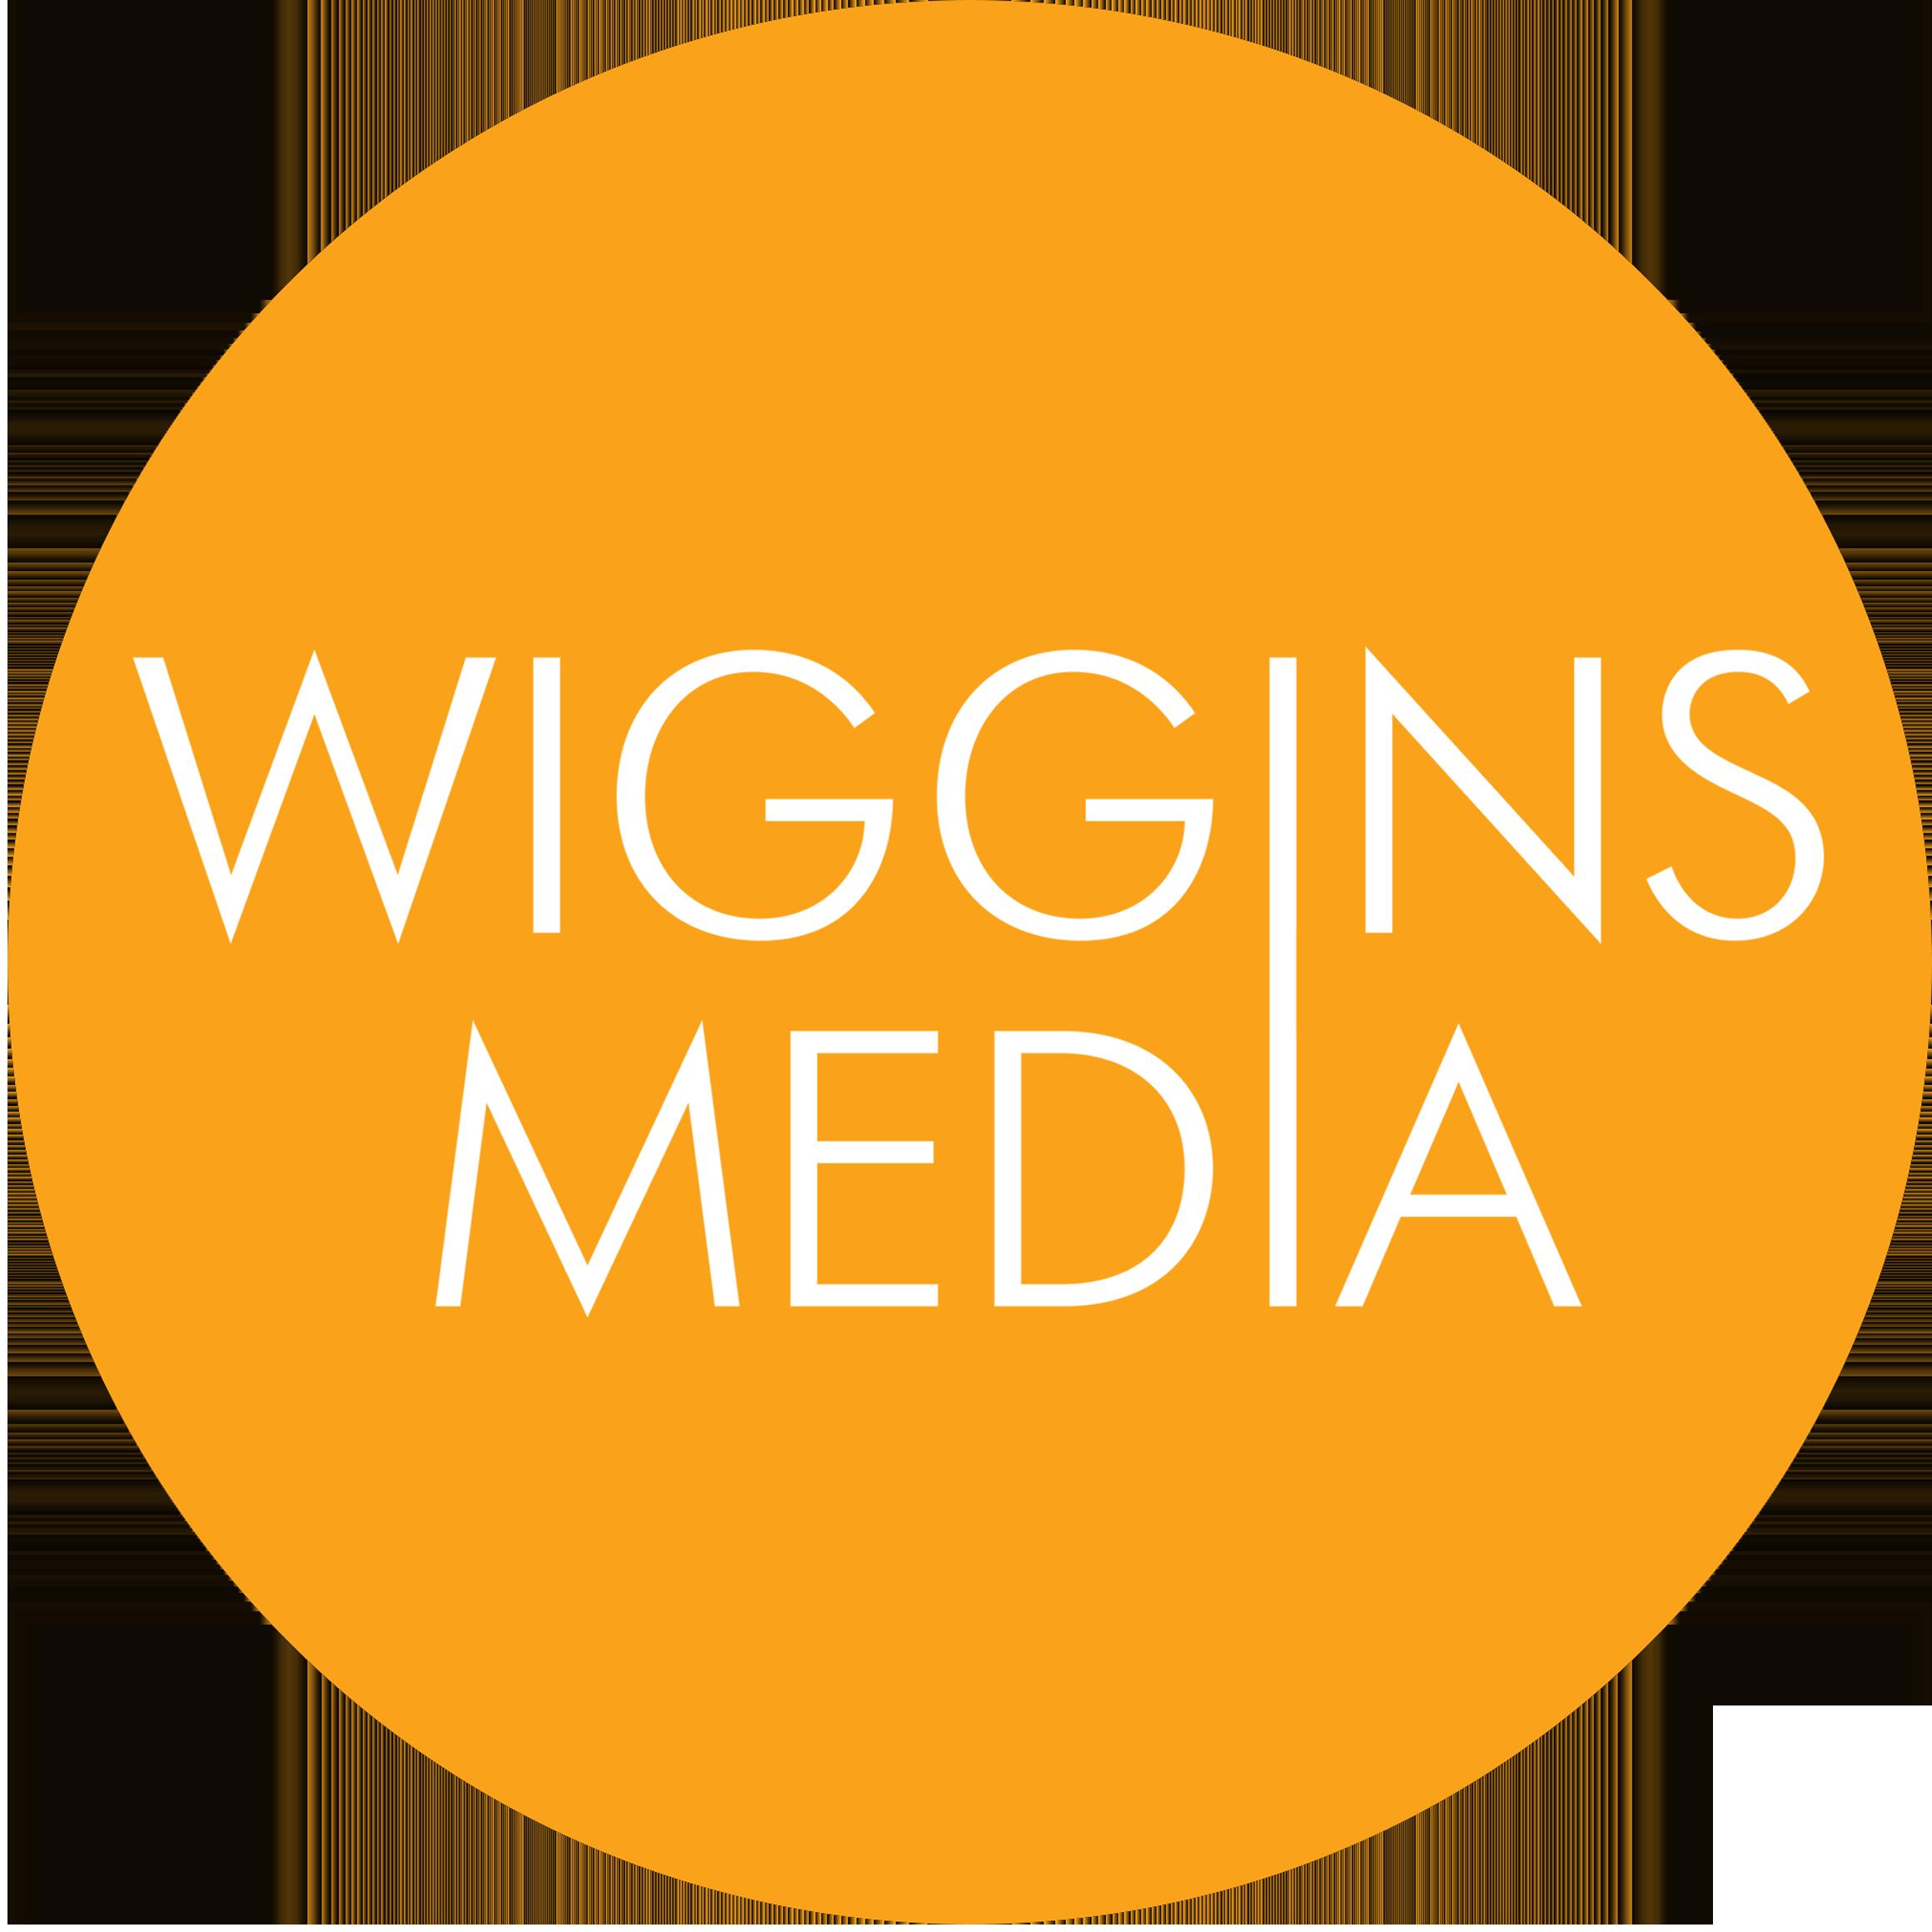 WIGGINS MEDIA